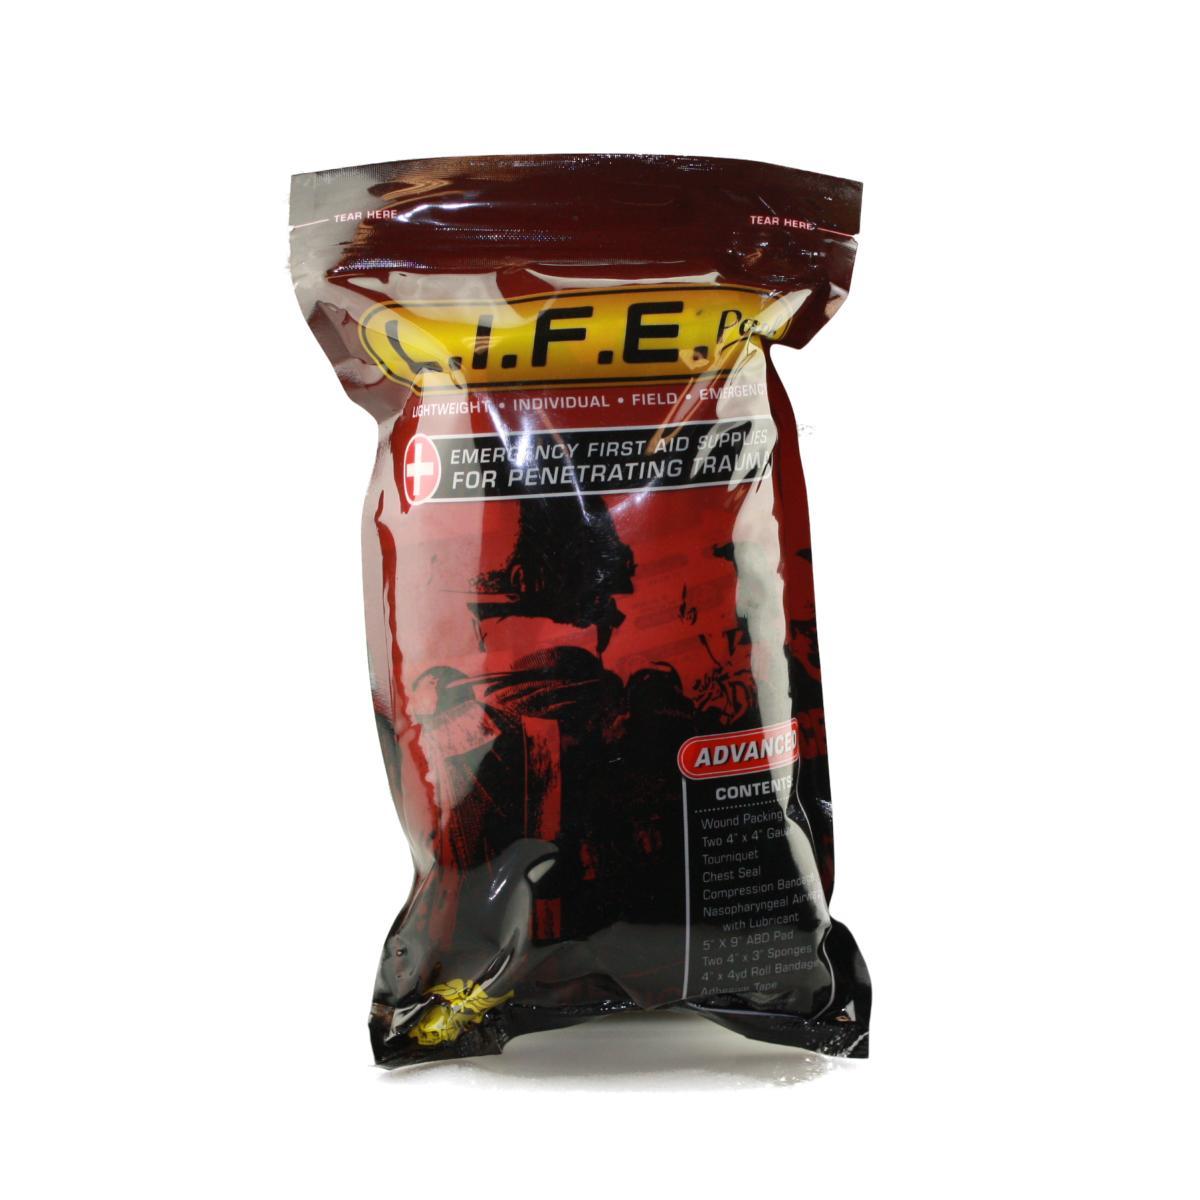 Voodoo Tactical L.I.F.E. Advanced, Penetrating Trauma First Aid Supplies